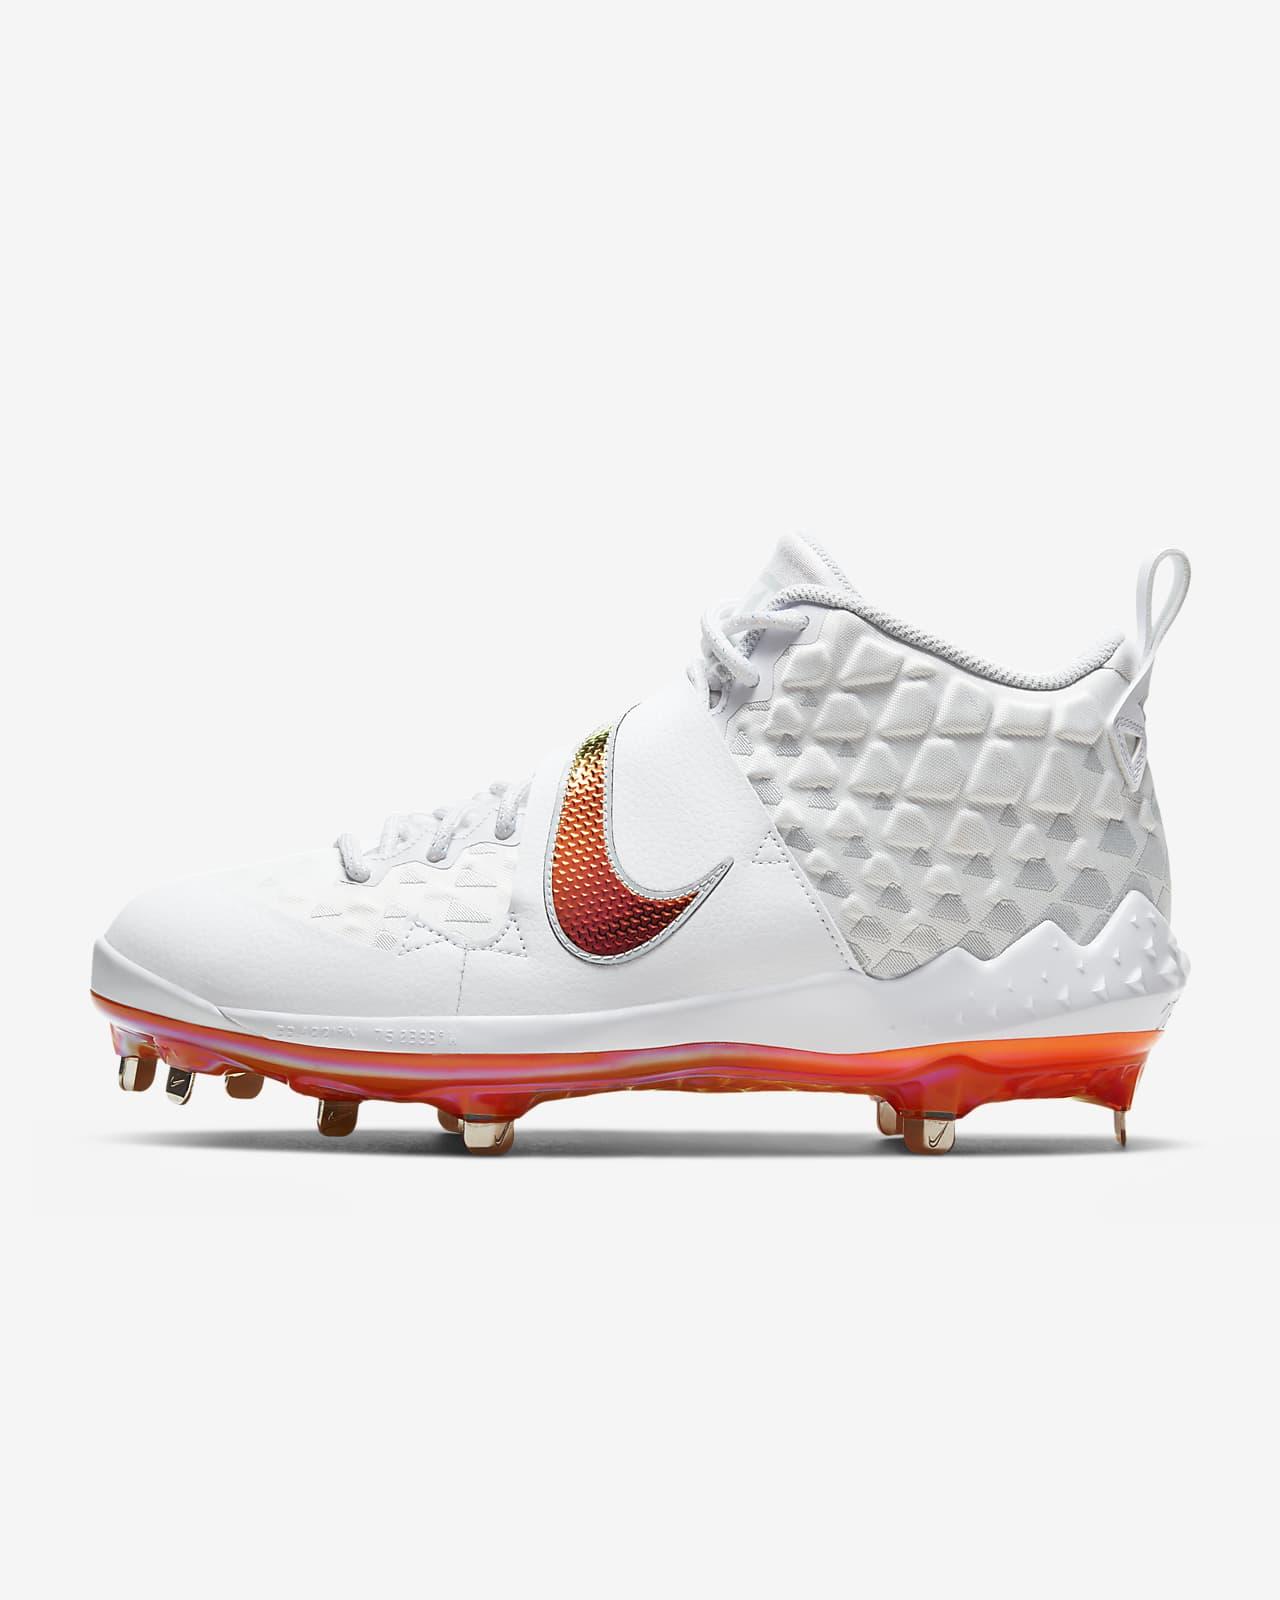 Nike Force Zoom Trout 6 Men's Baseball